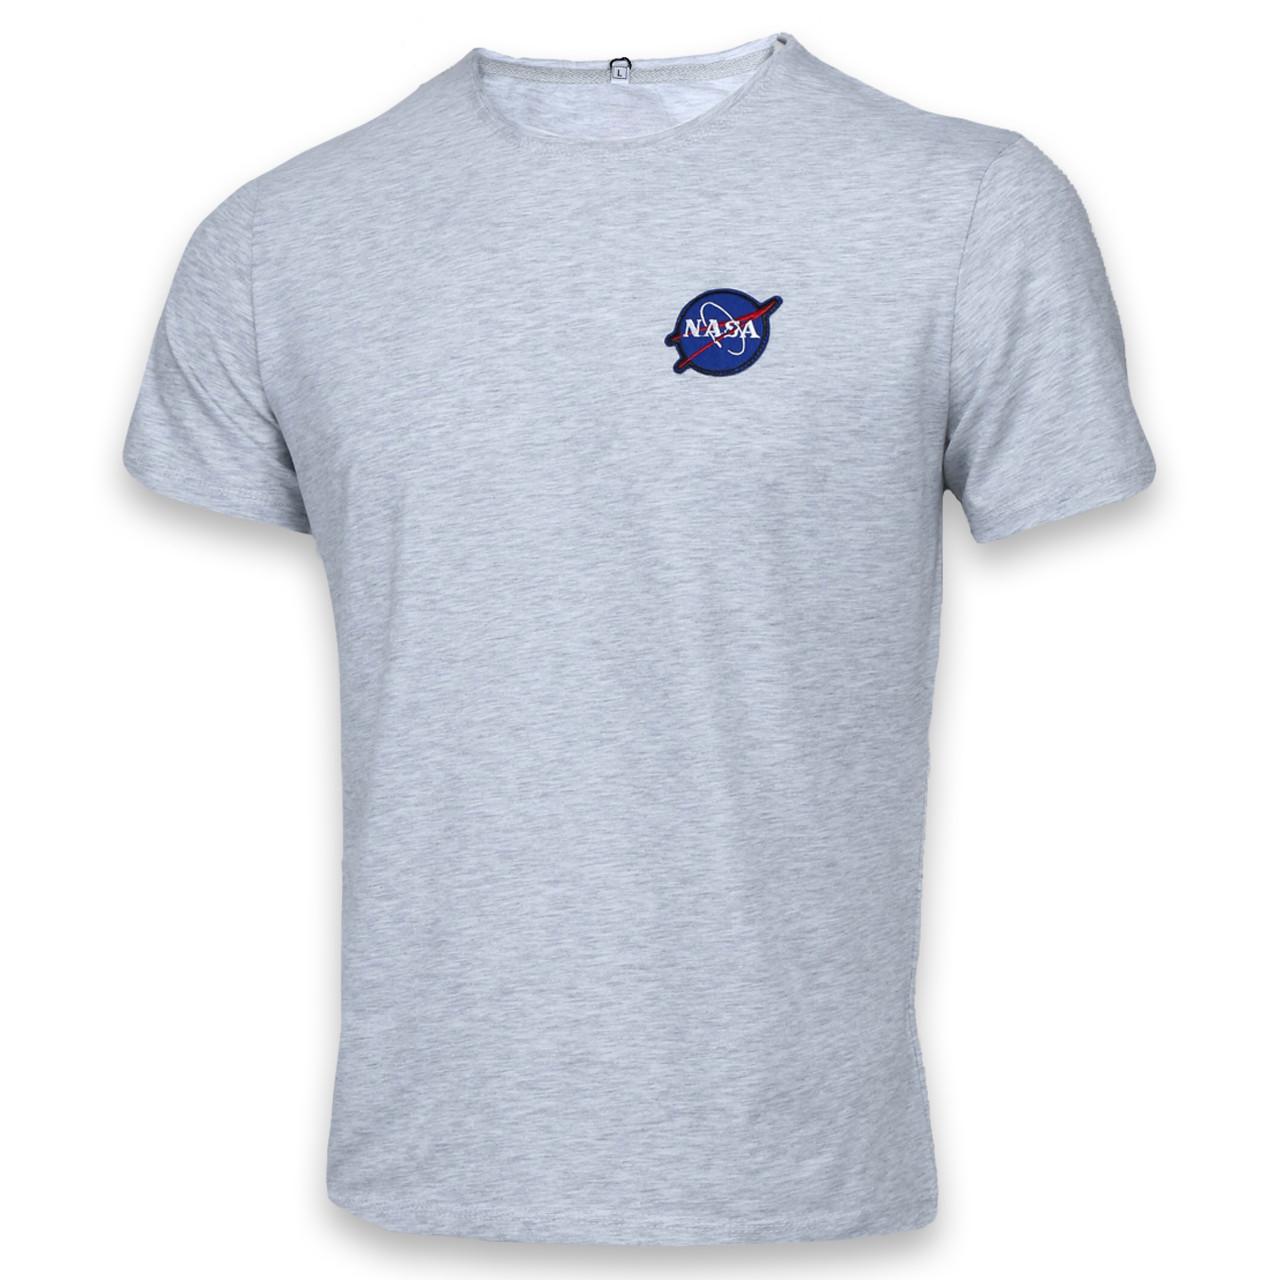 Футболка мужская бел меланж NASA с патчем Ф-10 WTGRI L(Р) 20-814-020